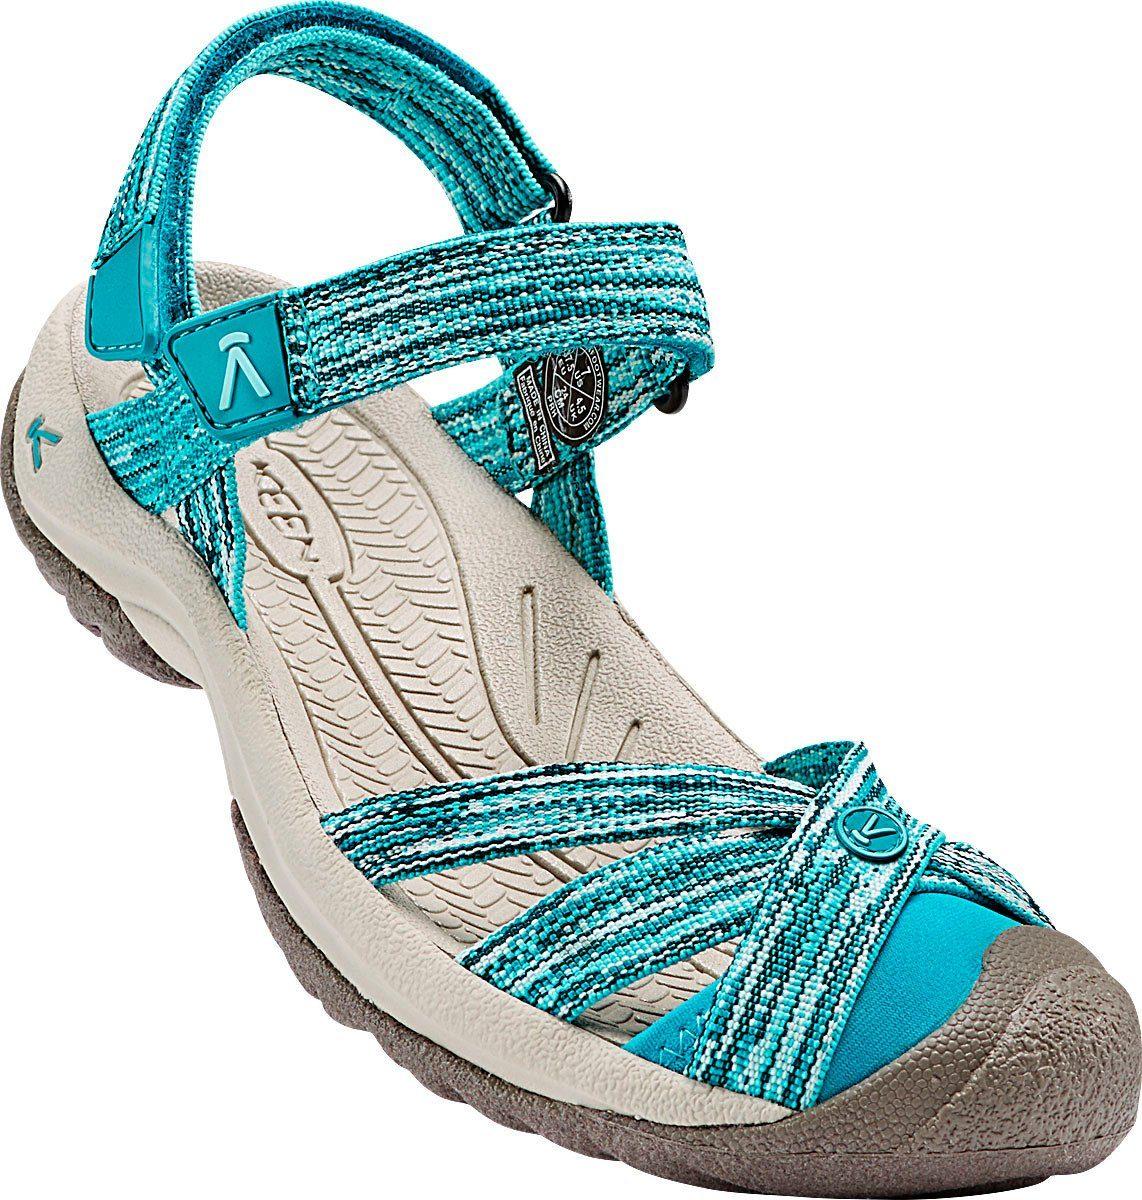 Keen Sandale Bali Strap Sandals Women kaufen  türkis